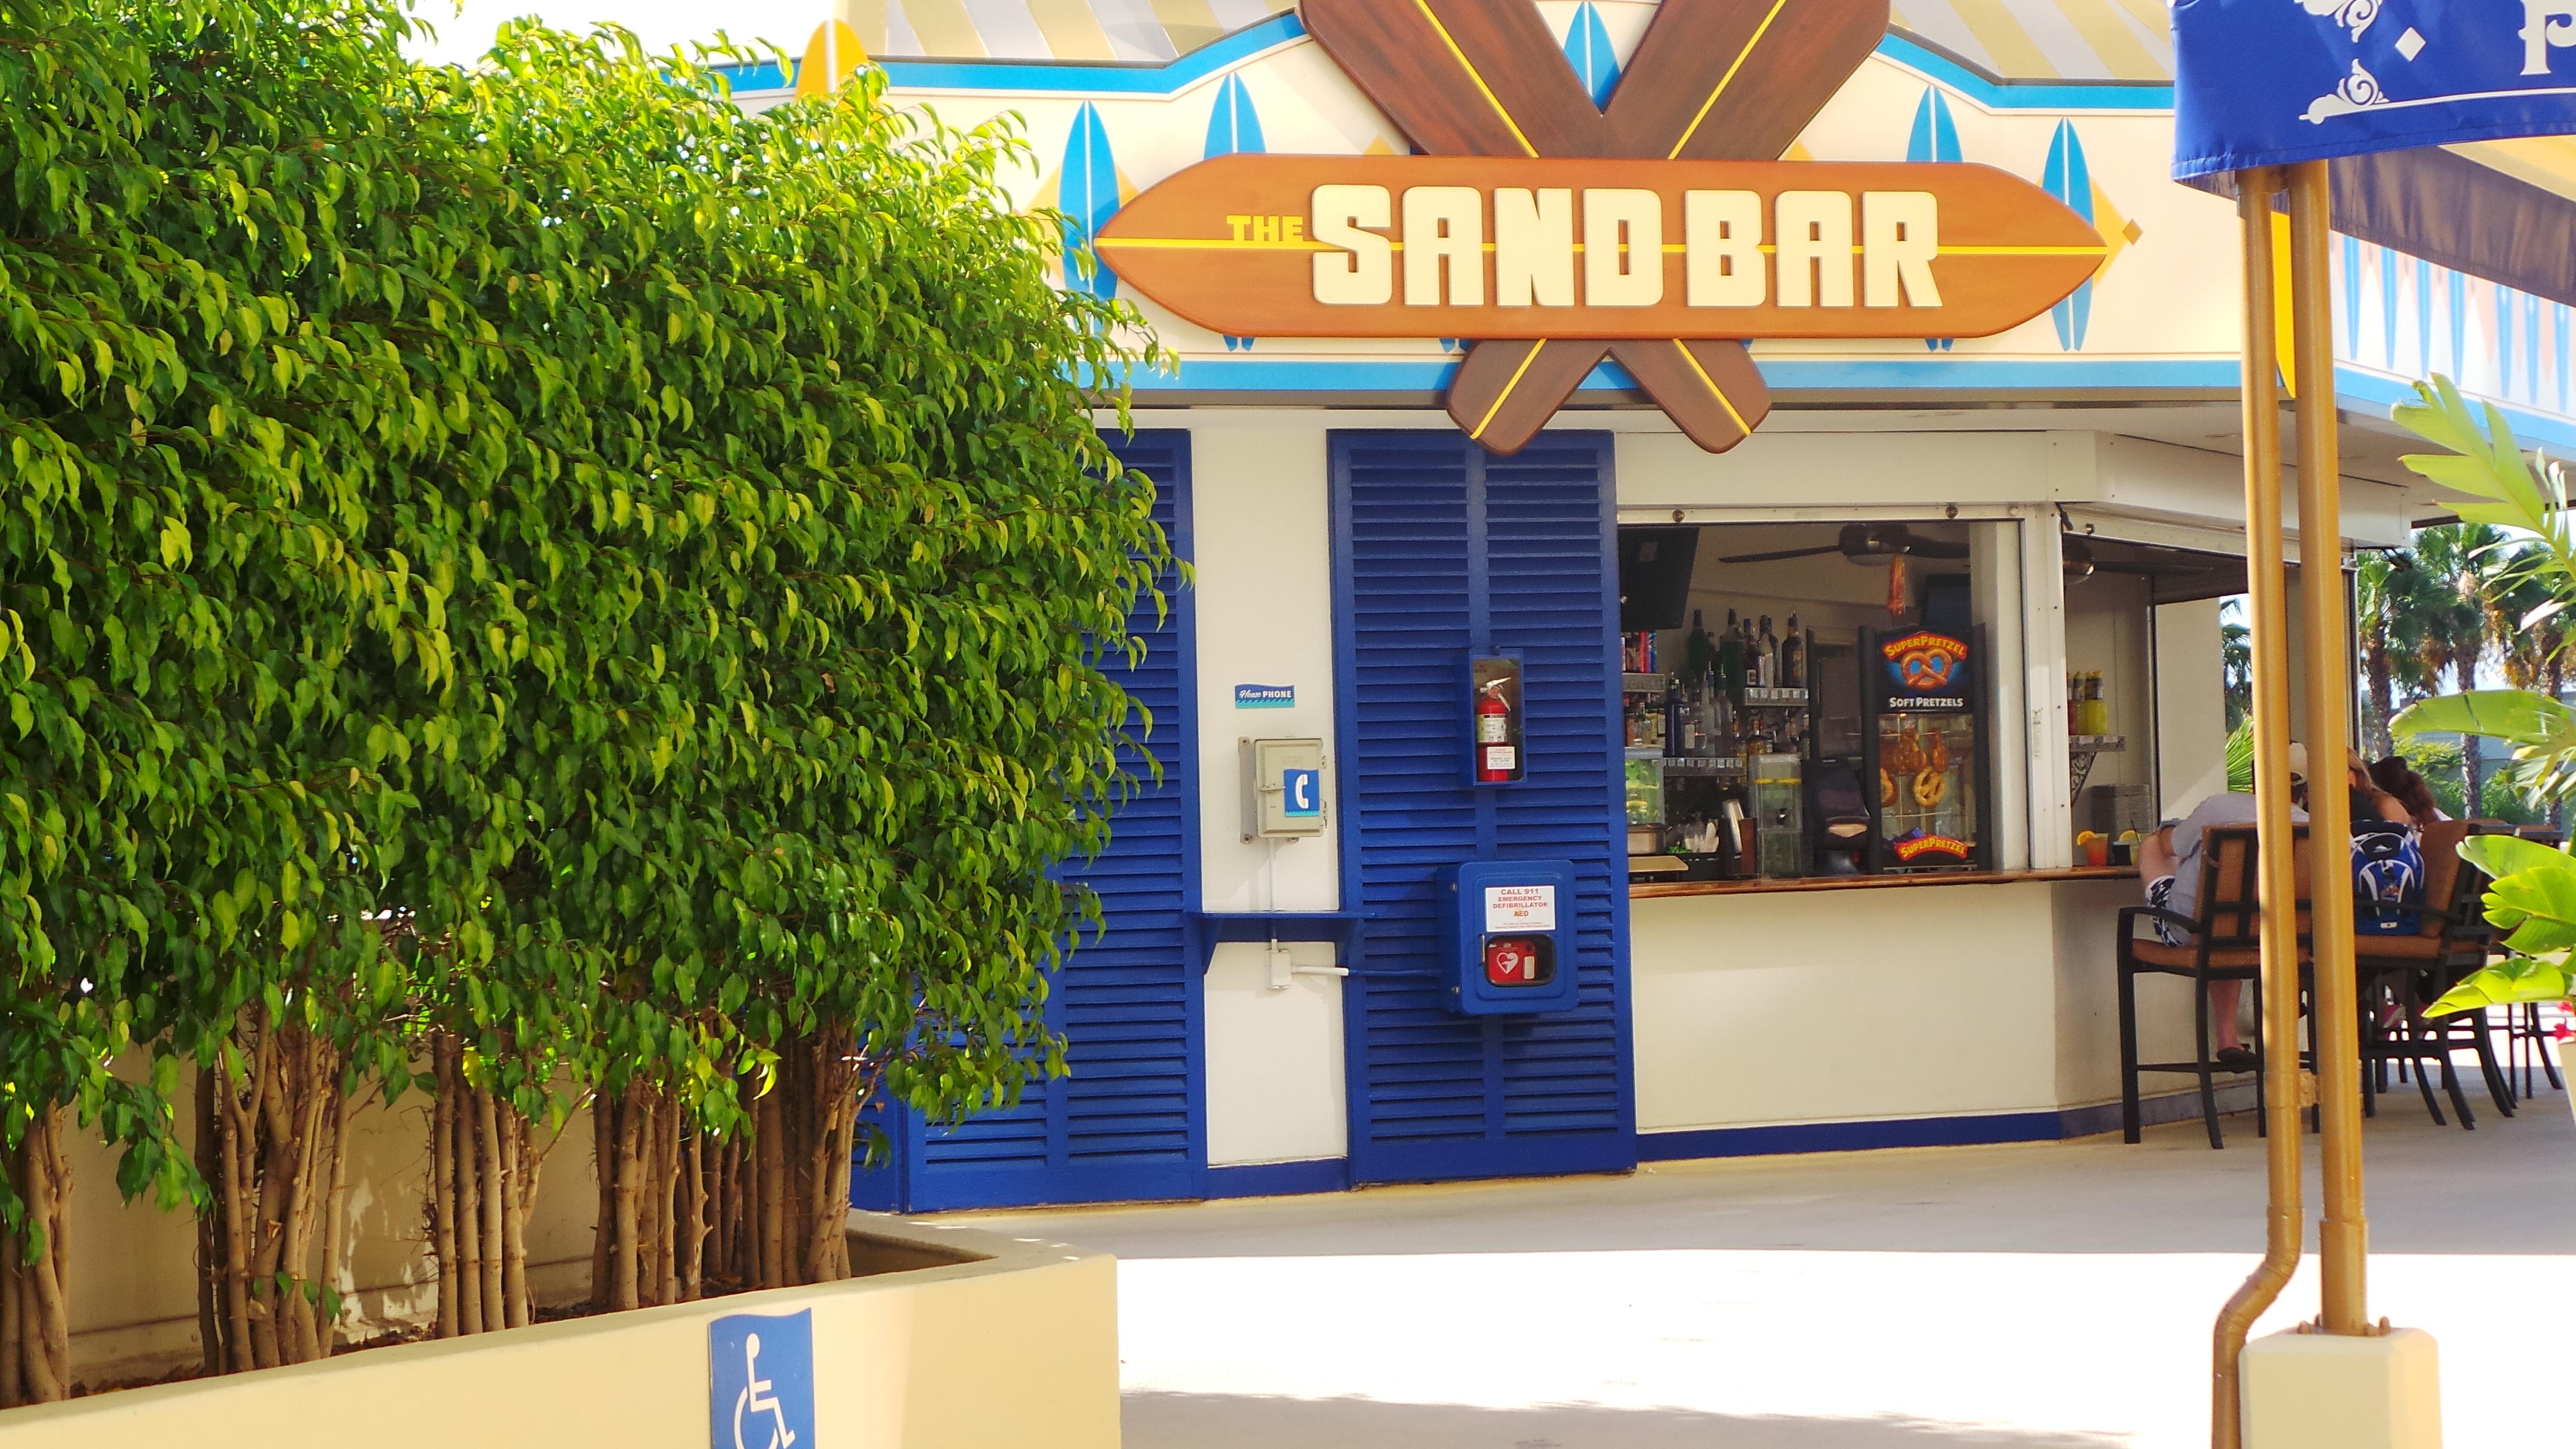 Outside view of the Sandbar